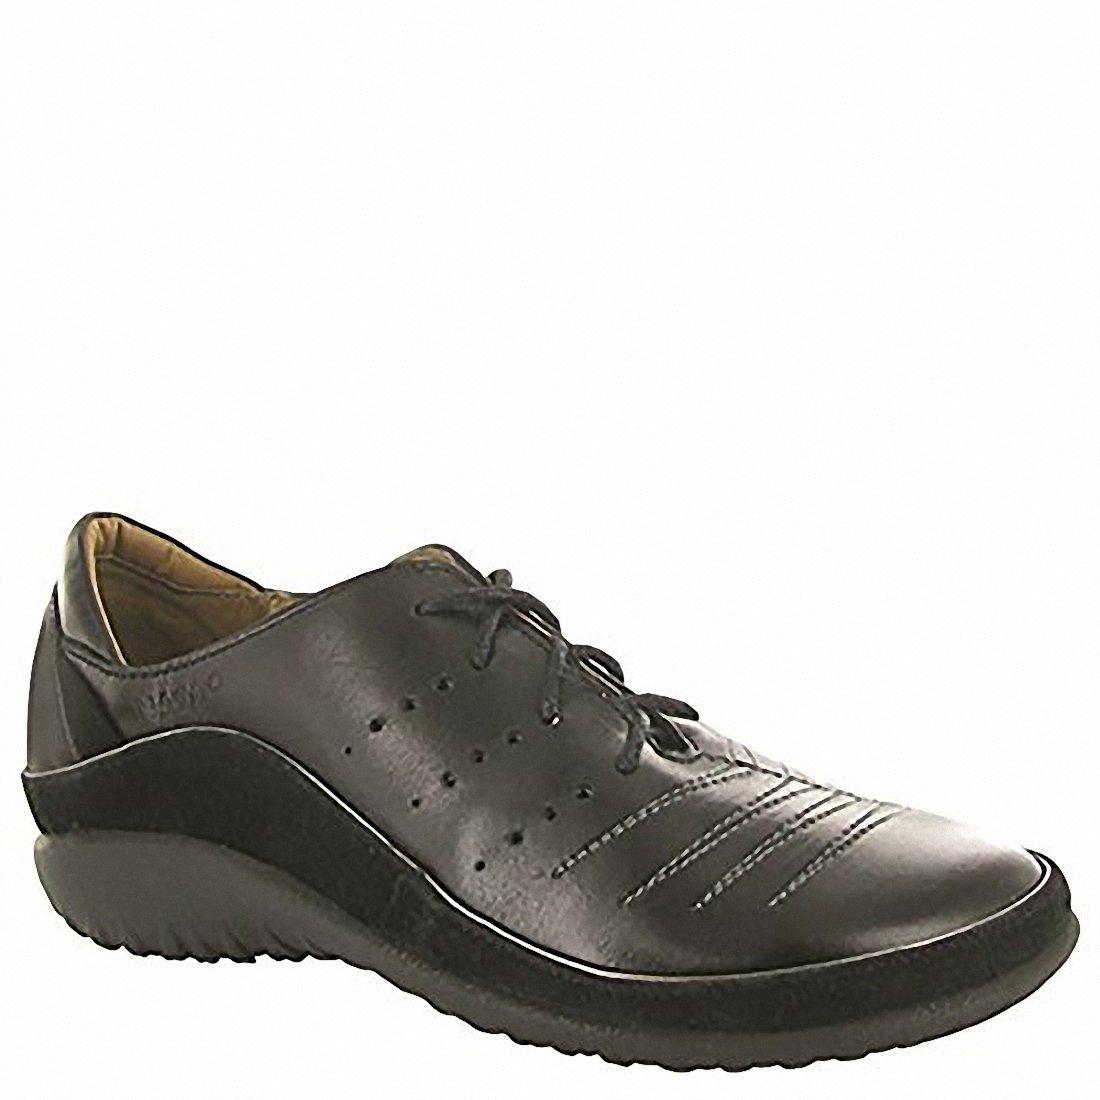 NAOT Kumara Koru Women Flats Shoes B01MG3K695 37 M EU|Black Madras/Black Suede